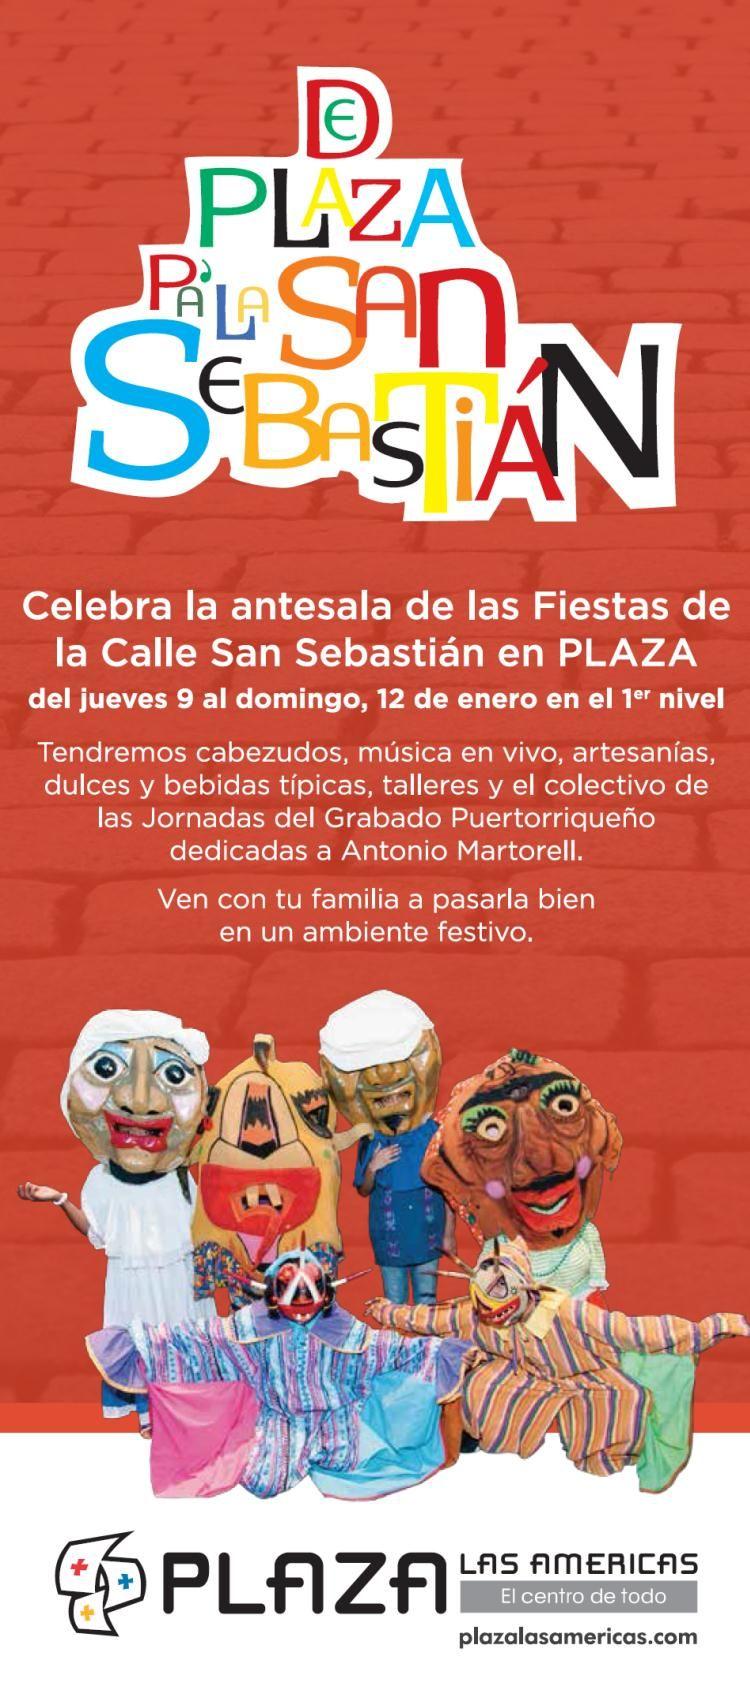 De Plaza Pa' La San Sebastián @ Plaza Las Américas #sondeaquipr #plazalasamericas #sanse2014